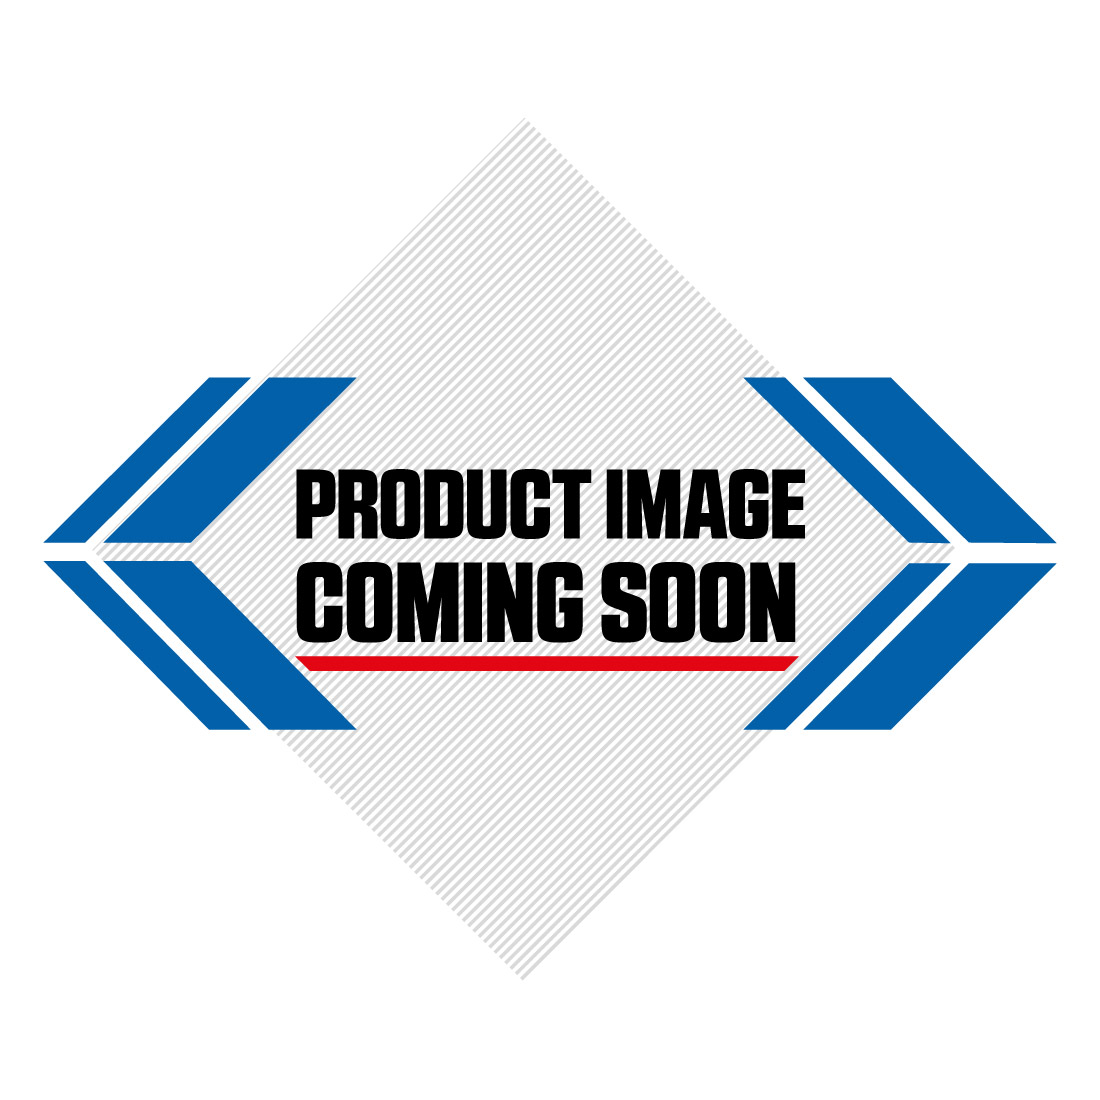 Kawasaki Restyled Plastic Kit KX 85 (2010) OEM Factory Image-0